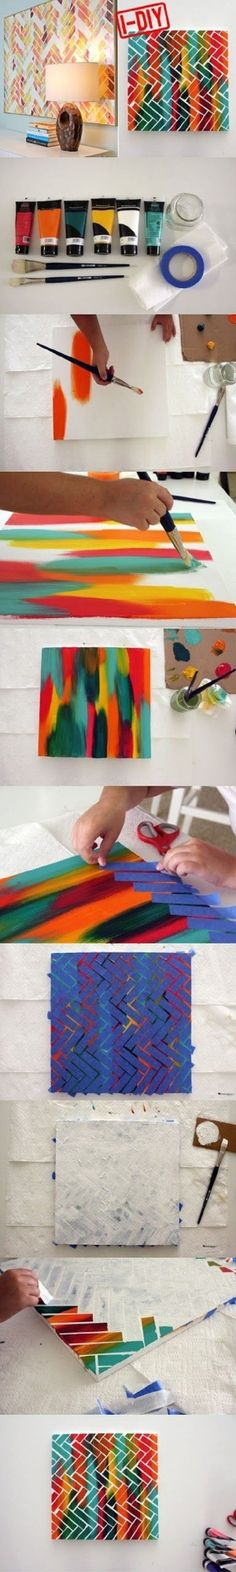 DIY Project Painters Tape Art